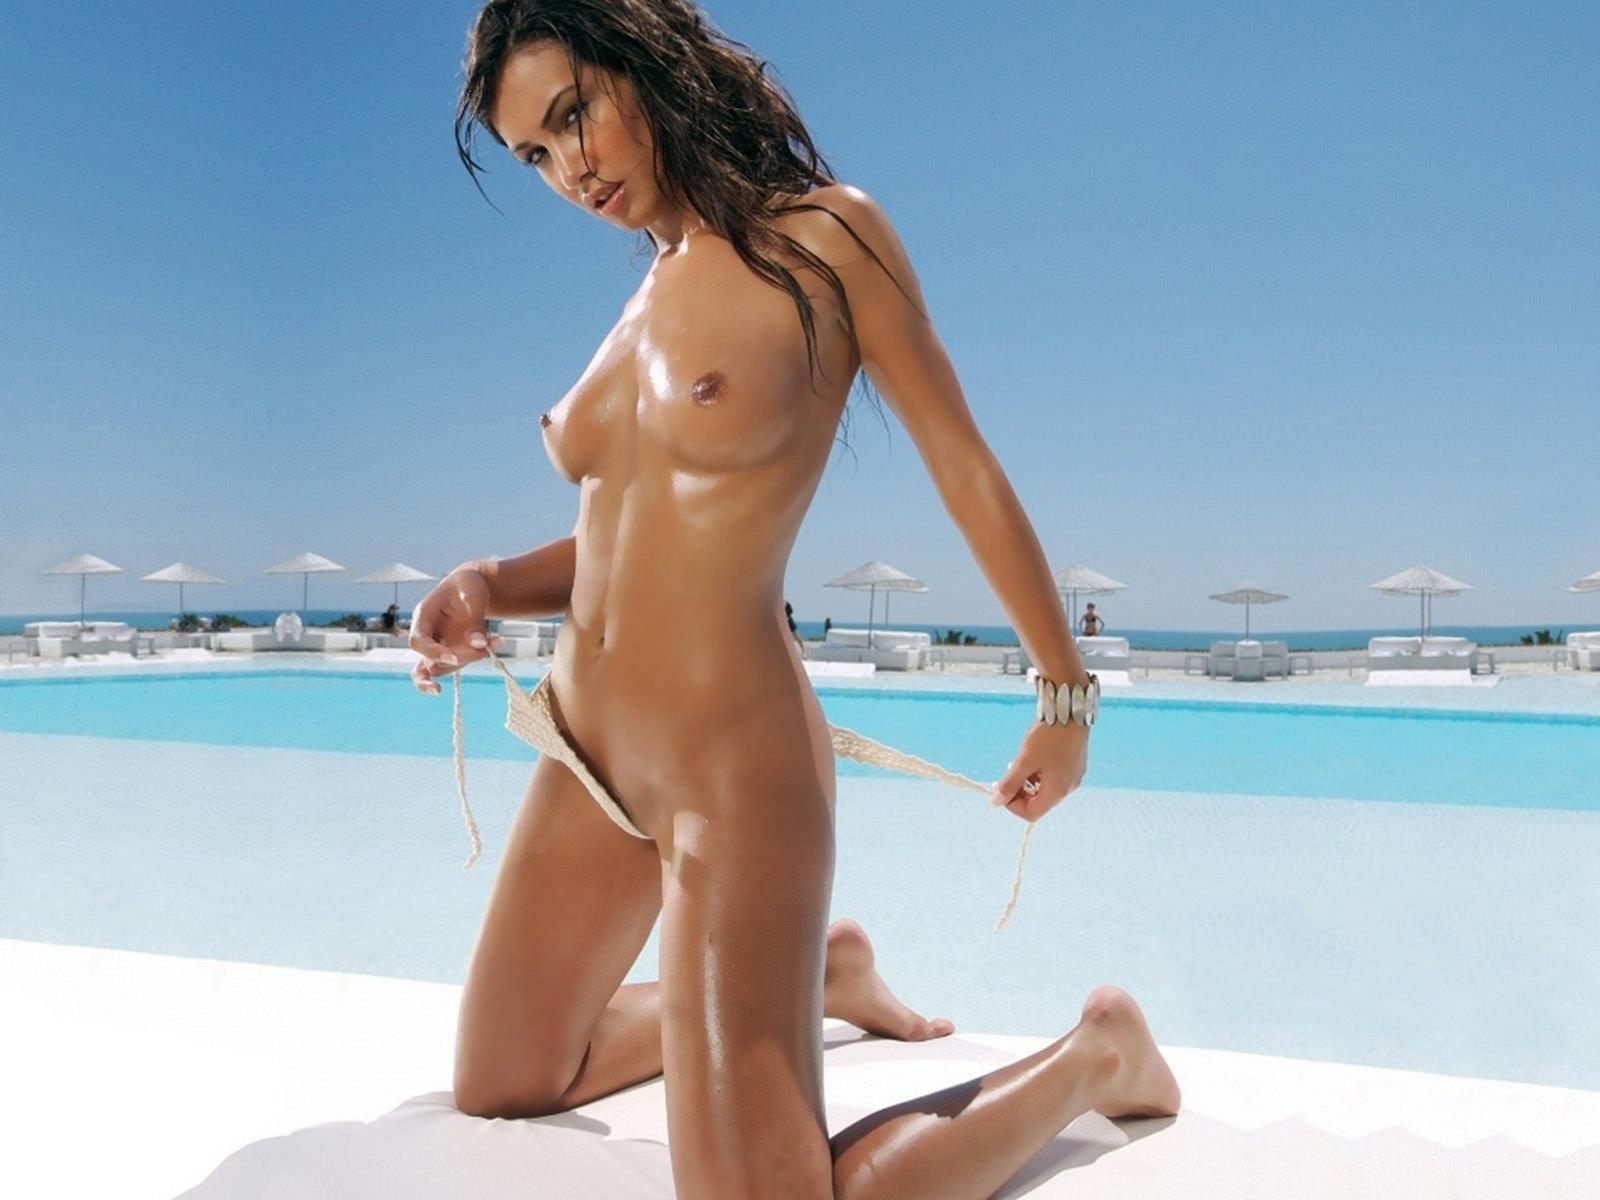 Фото секс голай девушки и парня 13 фотография